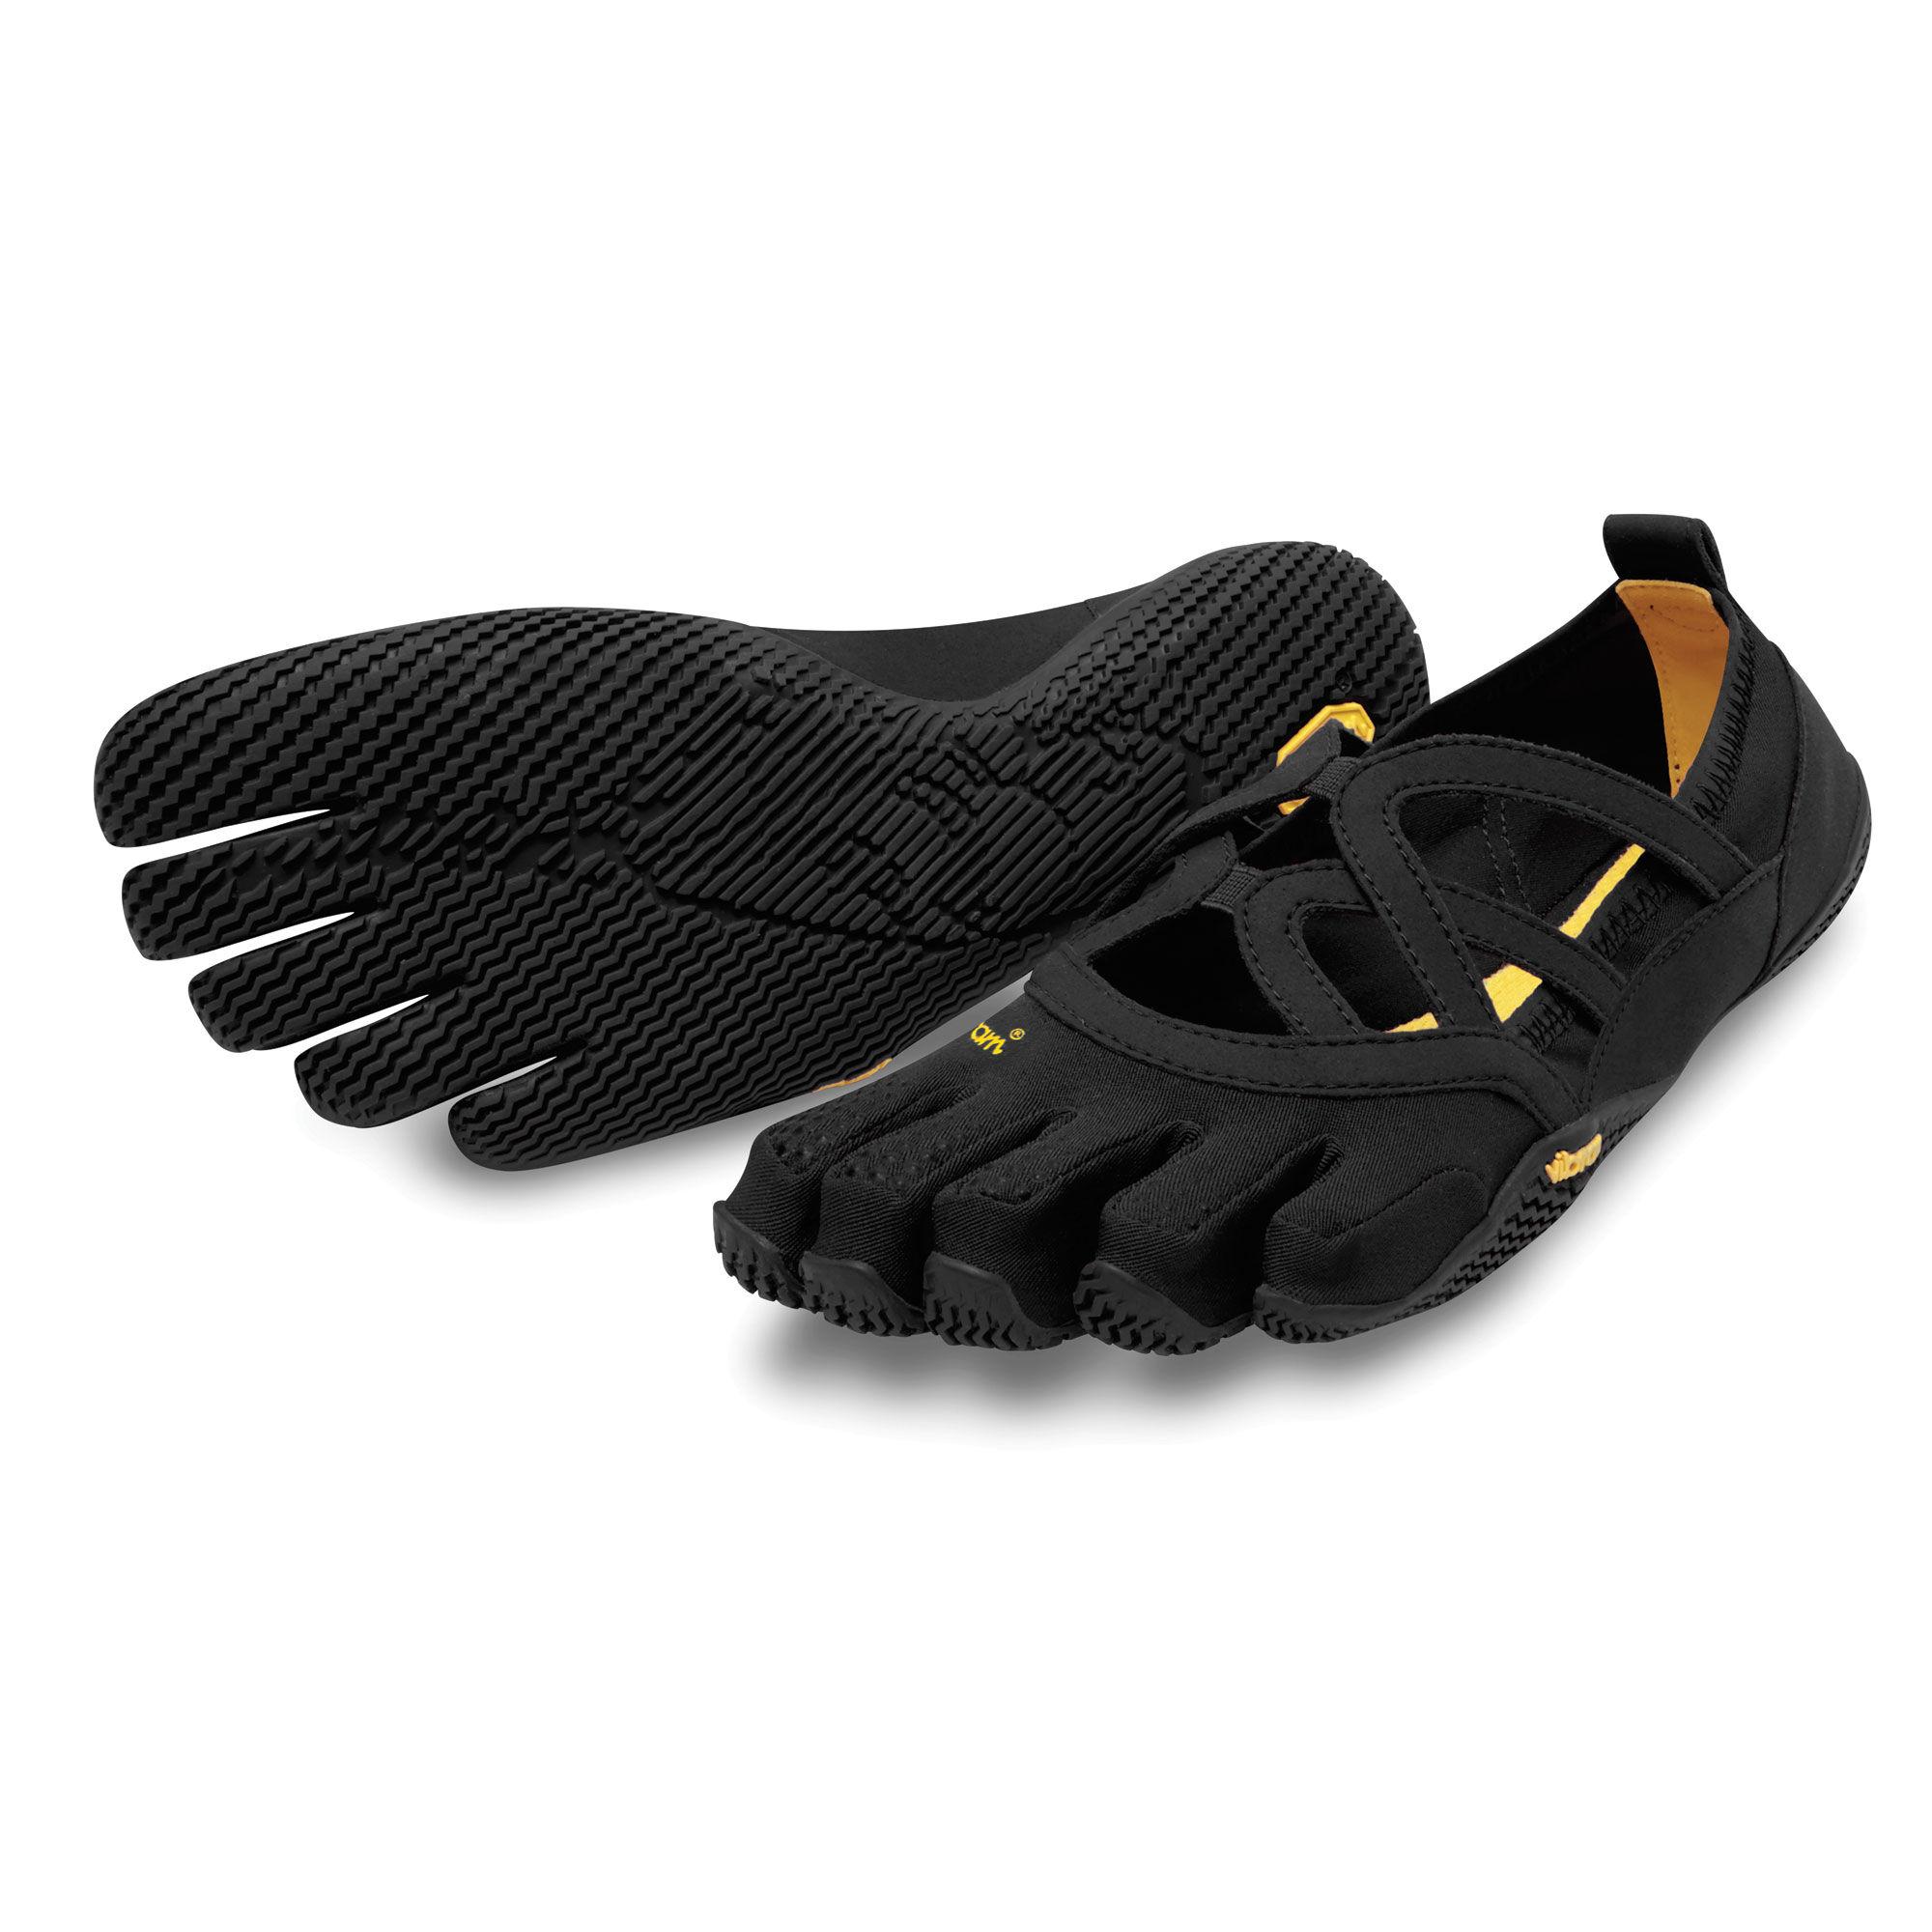 Vibram Classic Original Xs Trek Womens Trail Shoes K90f2139